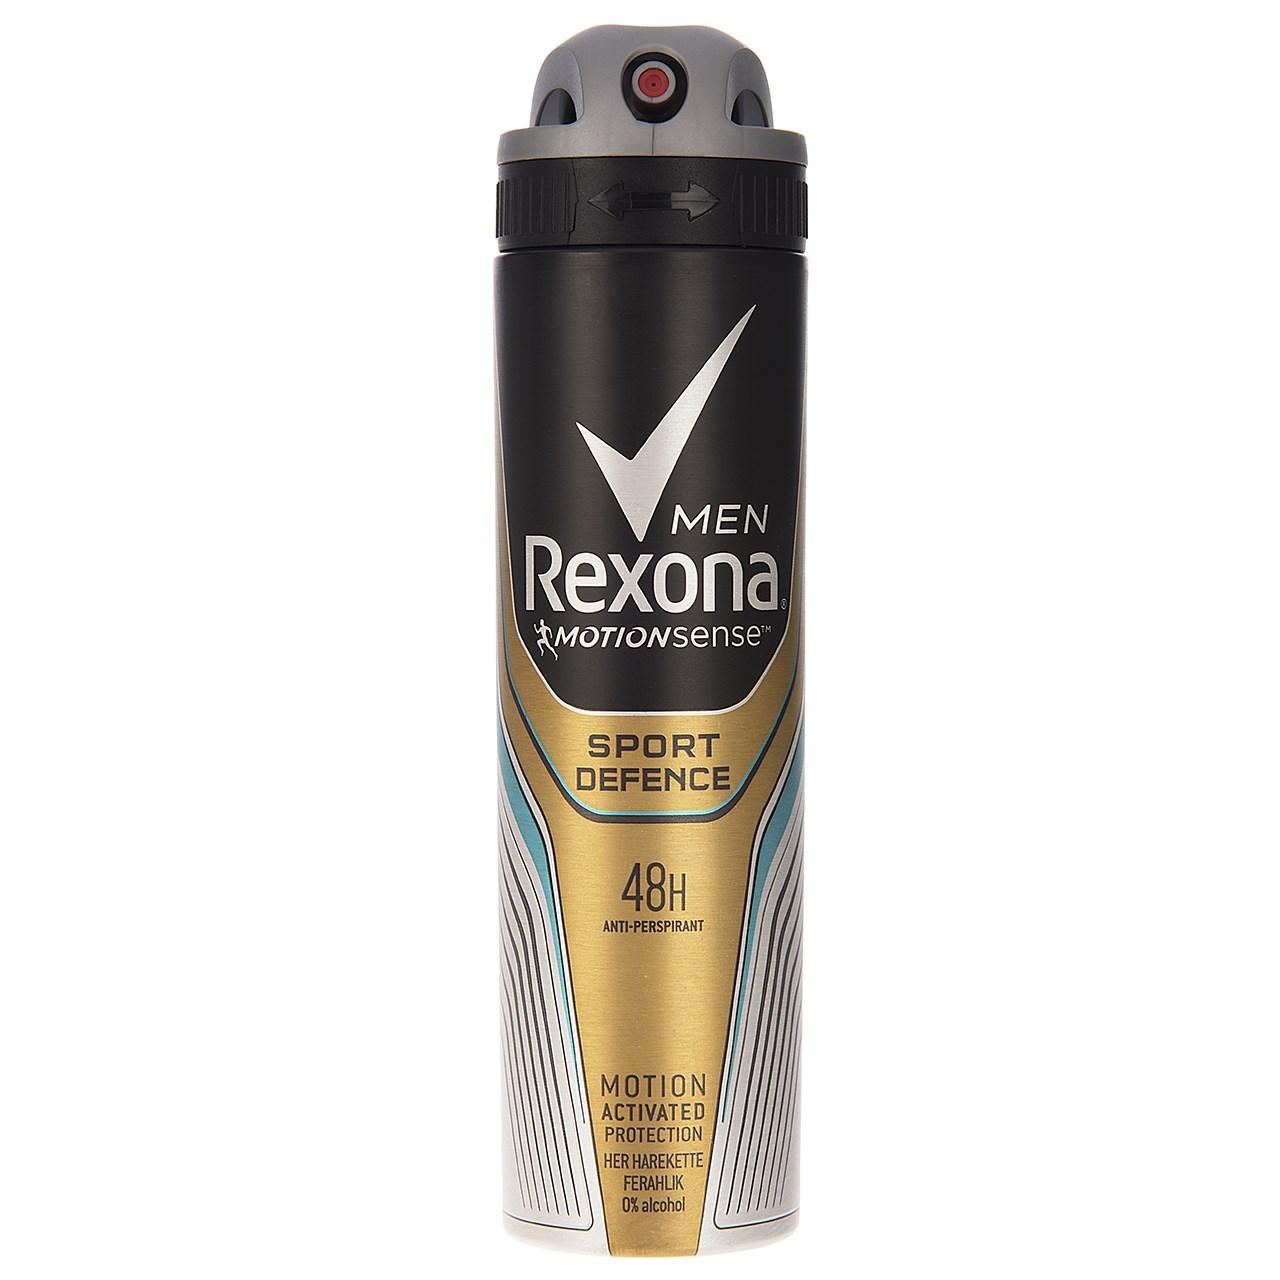 اسپری ضد تعریق مردانه رکسونا مدل Sport Defence حجم 150 میلی لیتر   Rexona Sport Defence Spray 150ml For Men